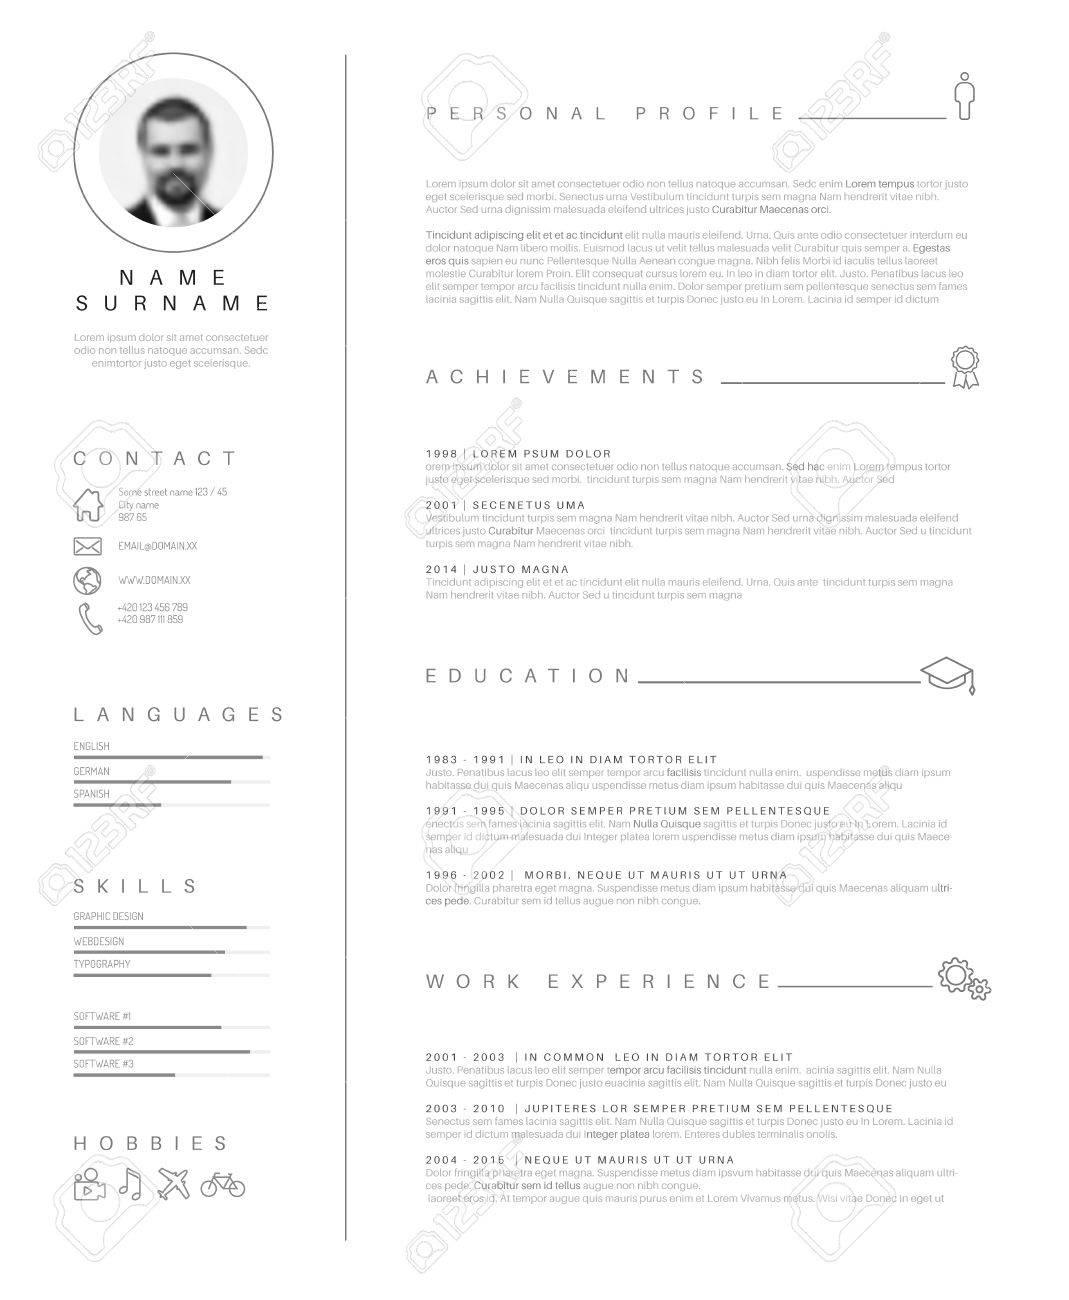 minimalist cv / resume template with nice typography design. - 57912893